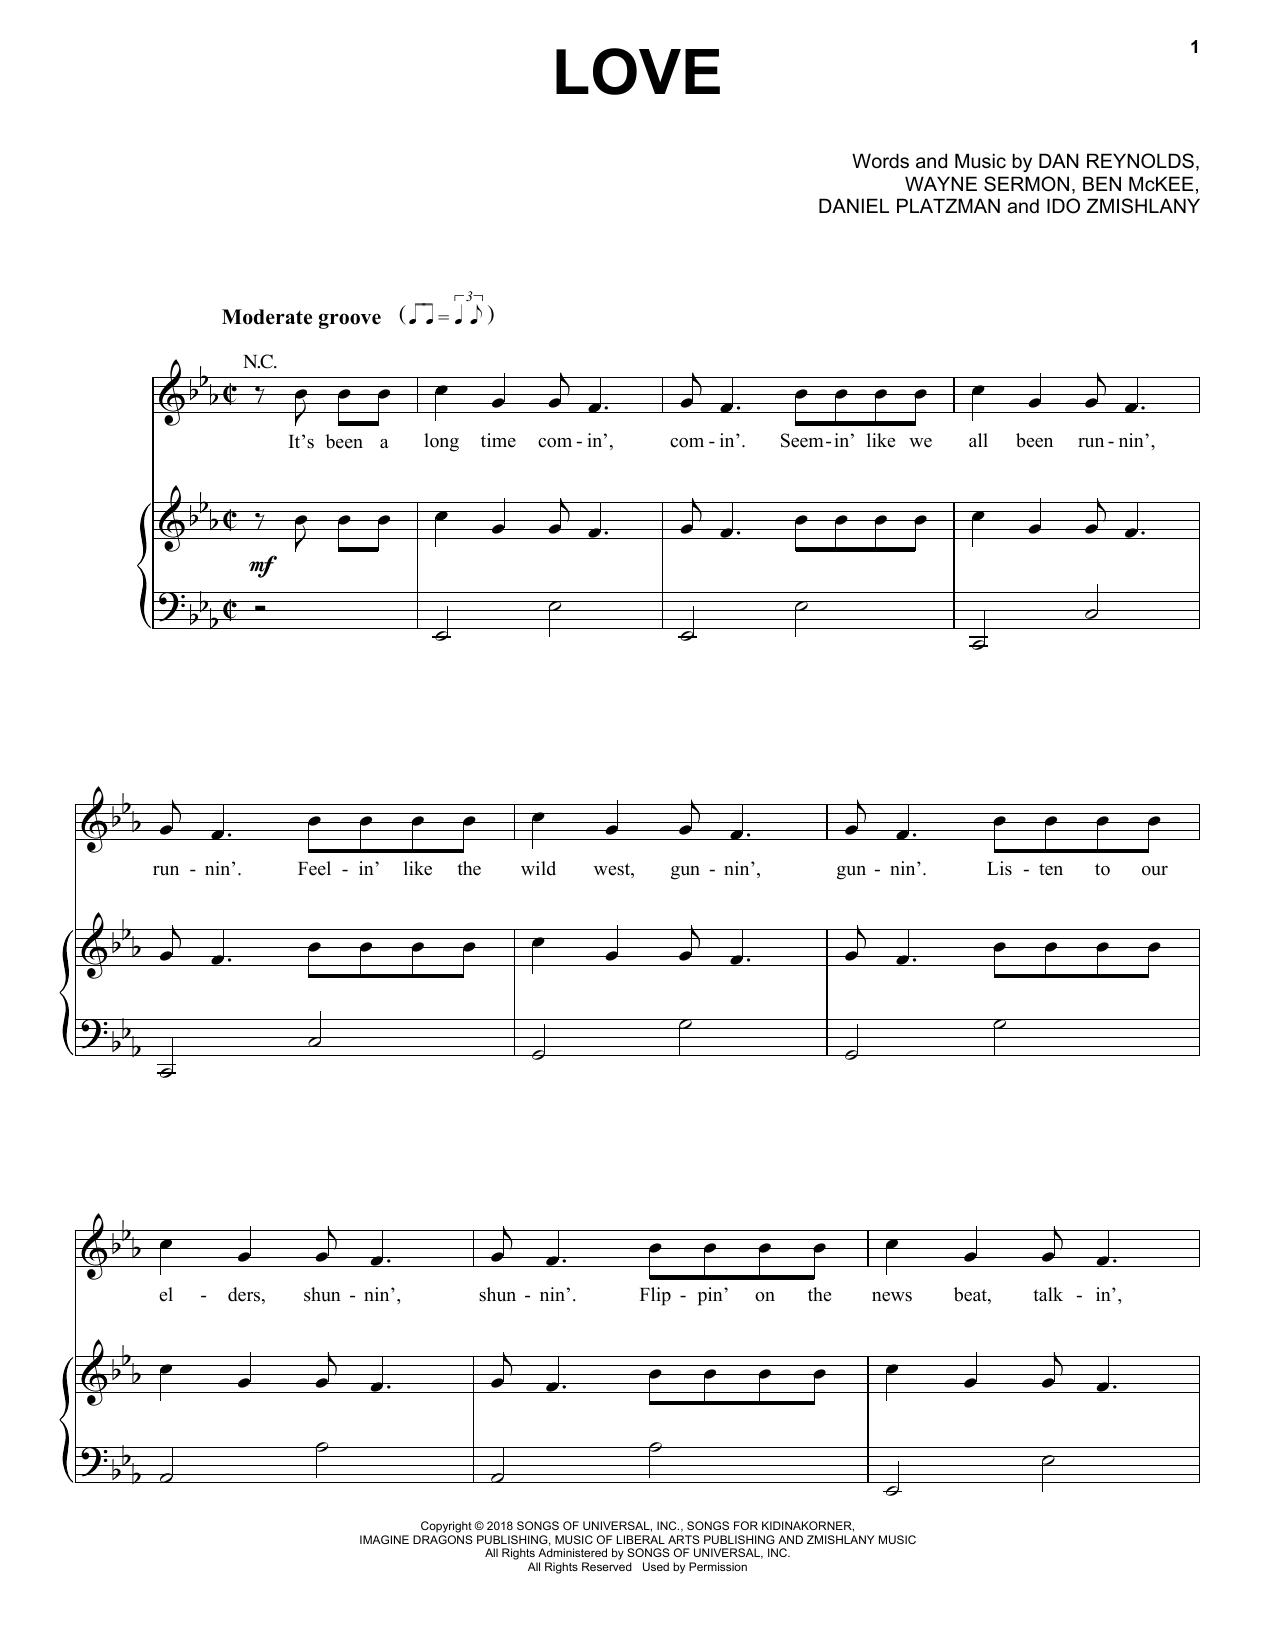 Imagine Dragons Love Sheet Music Notes Chords Score Download Printable Pdf Imagine Dragons Sheet Music Sheet Music Notes